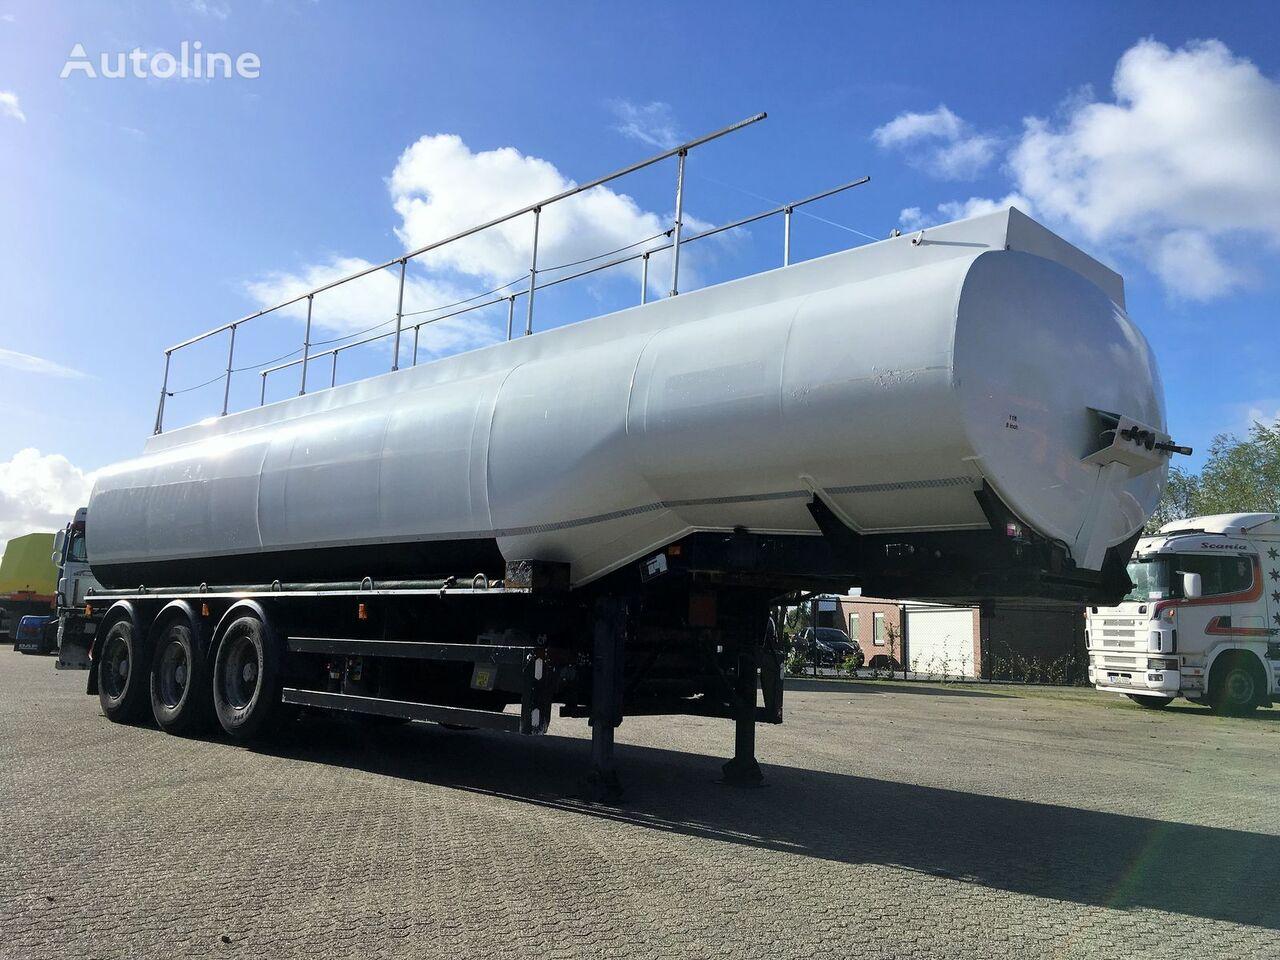 FRUEHAUF ADR 36.000ltr LGBF Diesel-Benzine brandstoftank oplegger